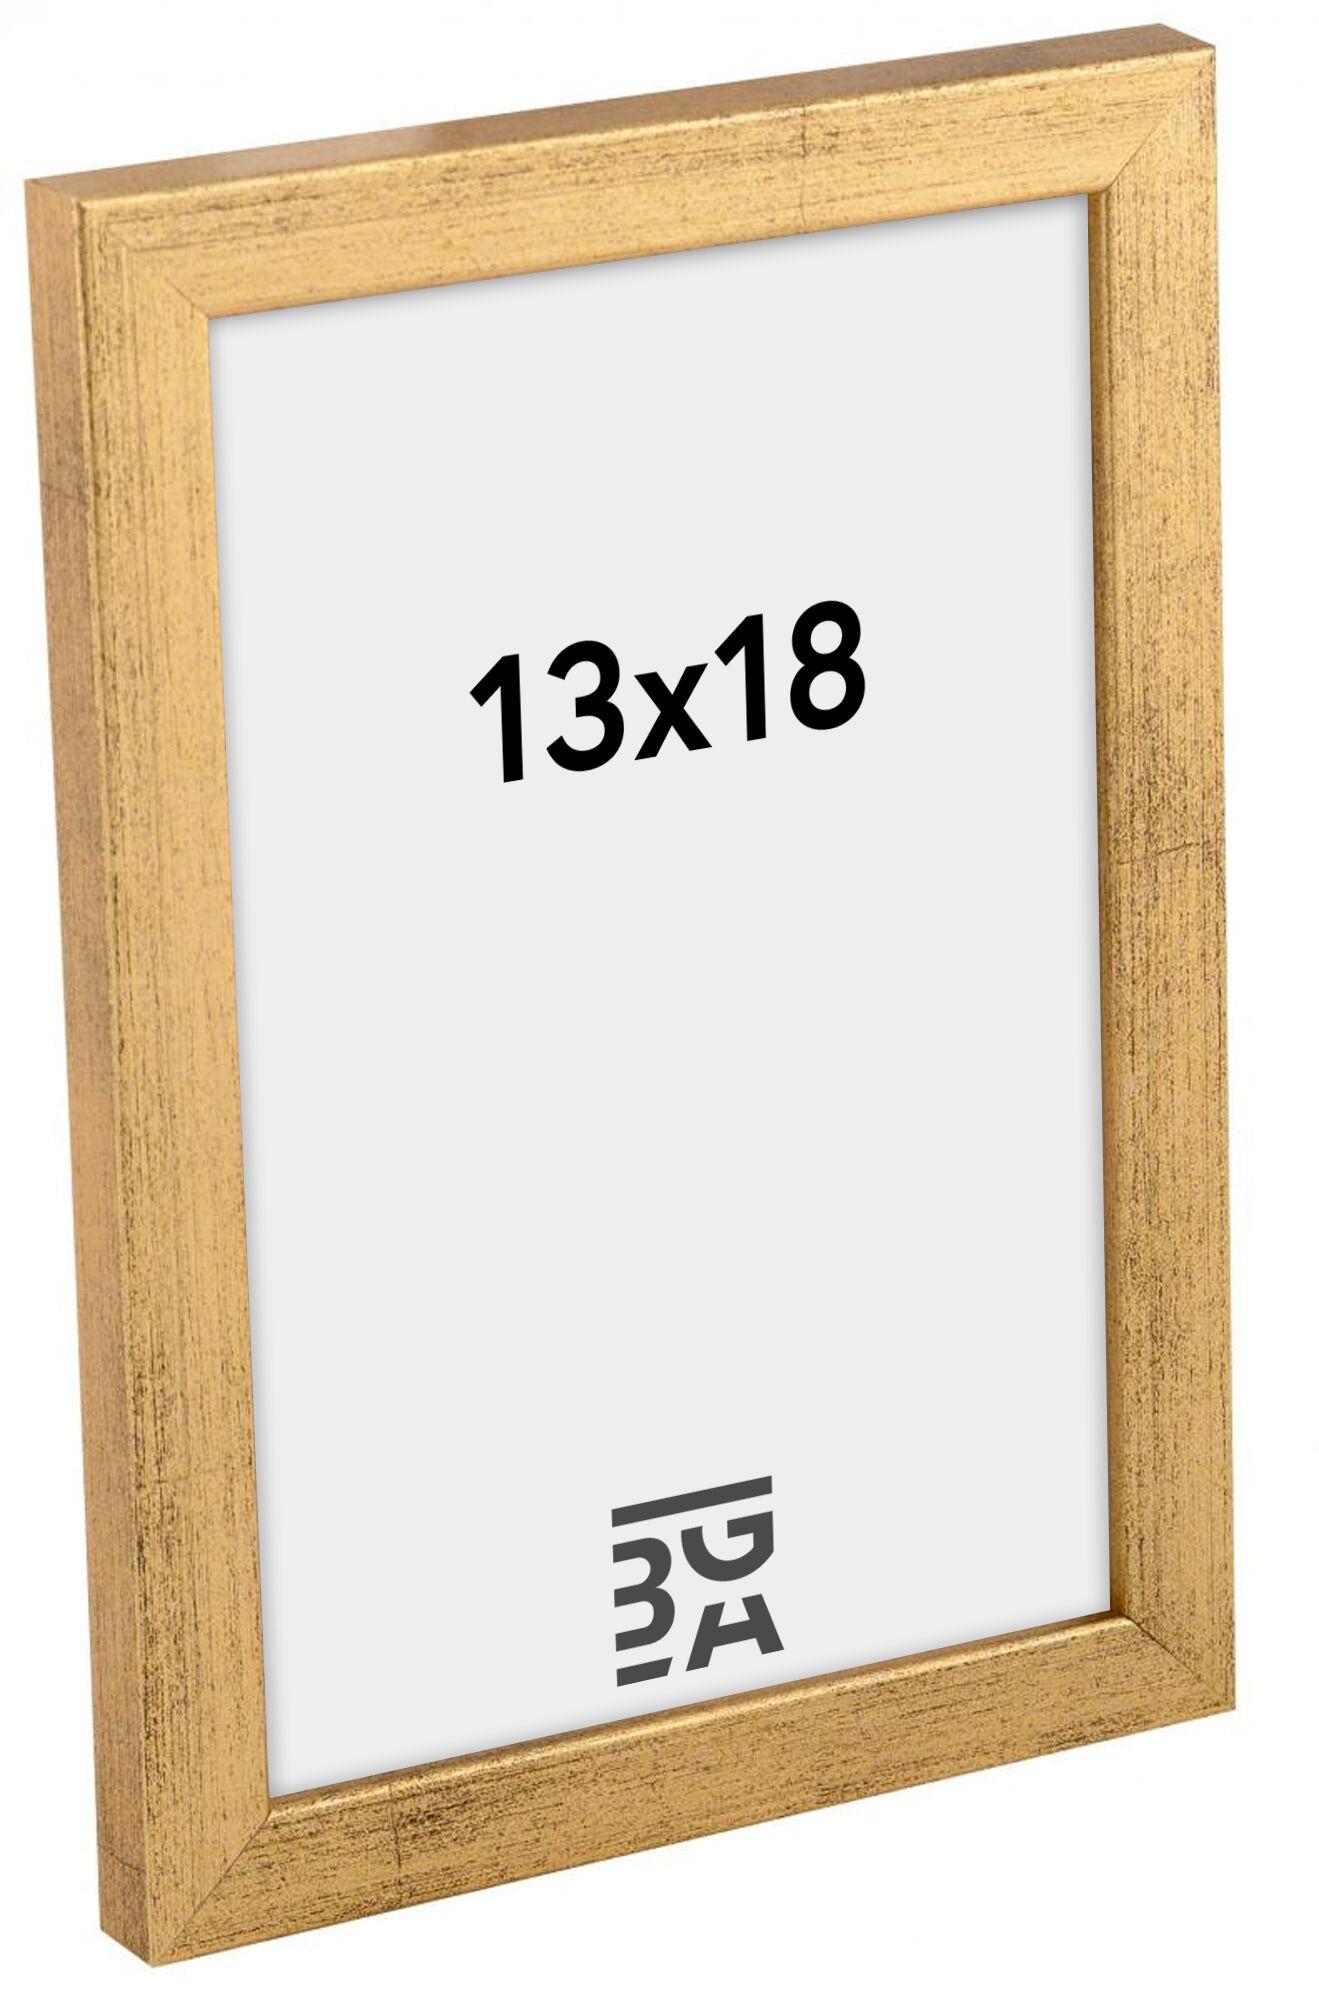 Estancia Galant Kullanvärinen 13x18 cm